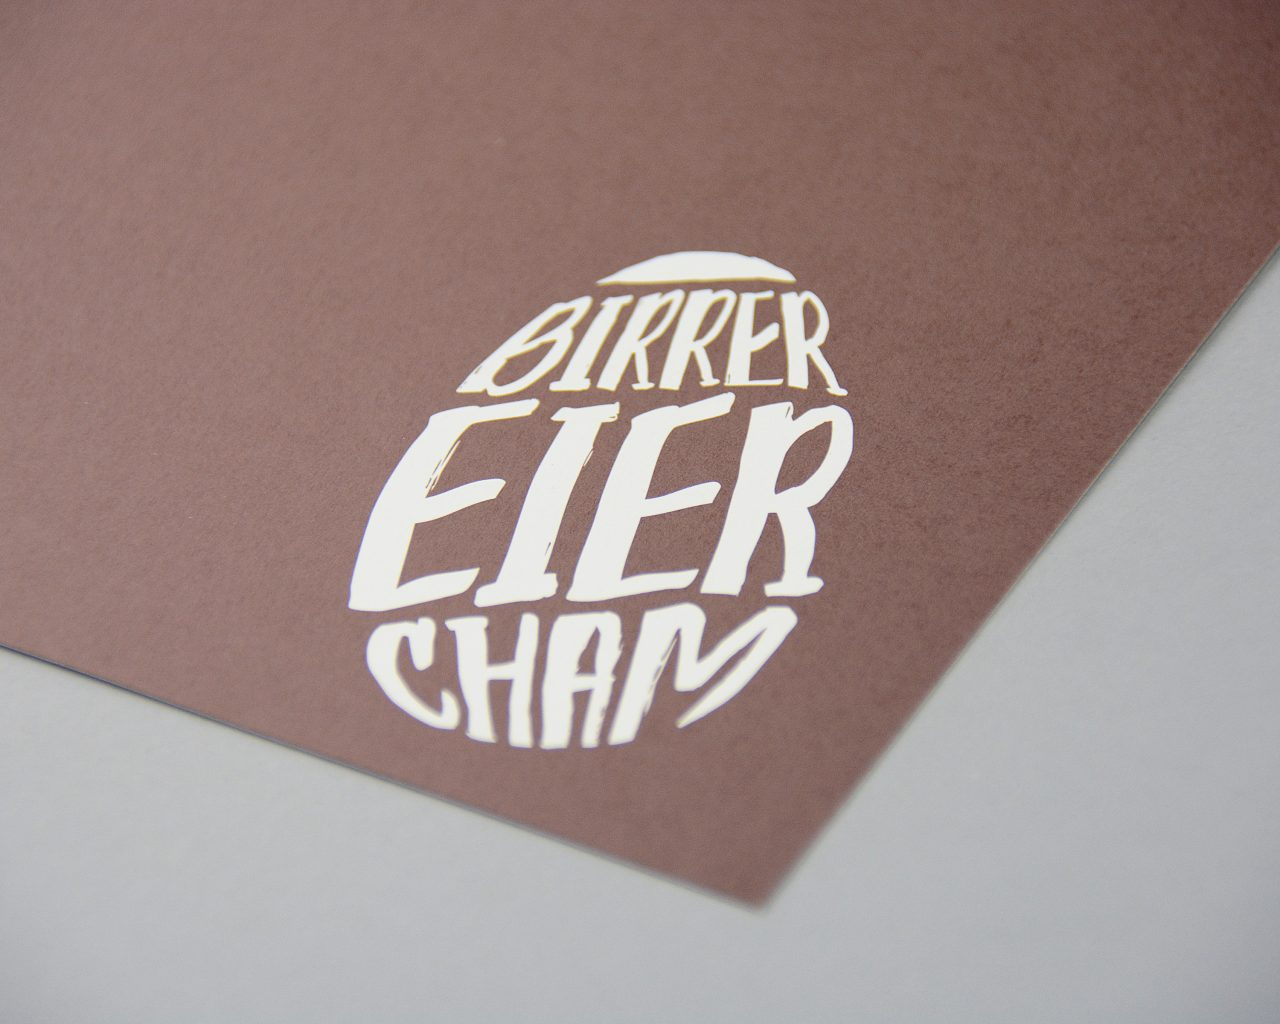 AGENTMEDIA_Birrer_Eier_Cham